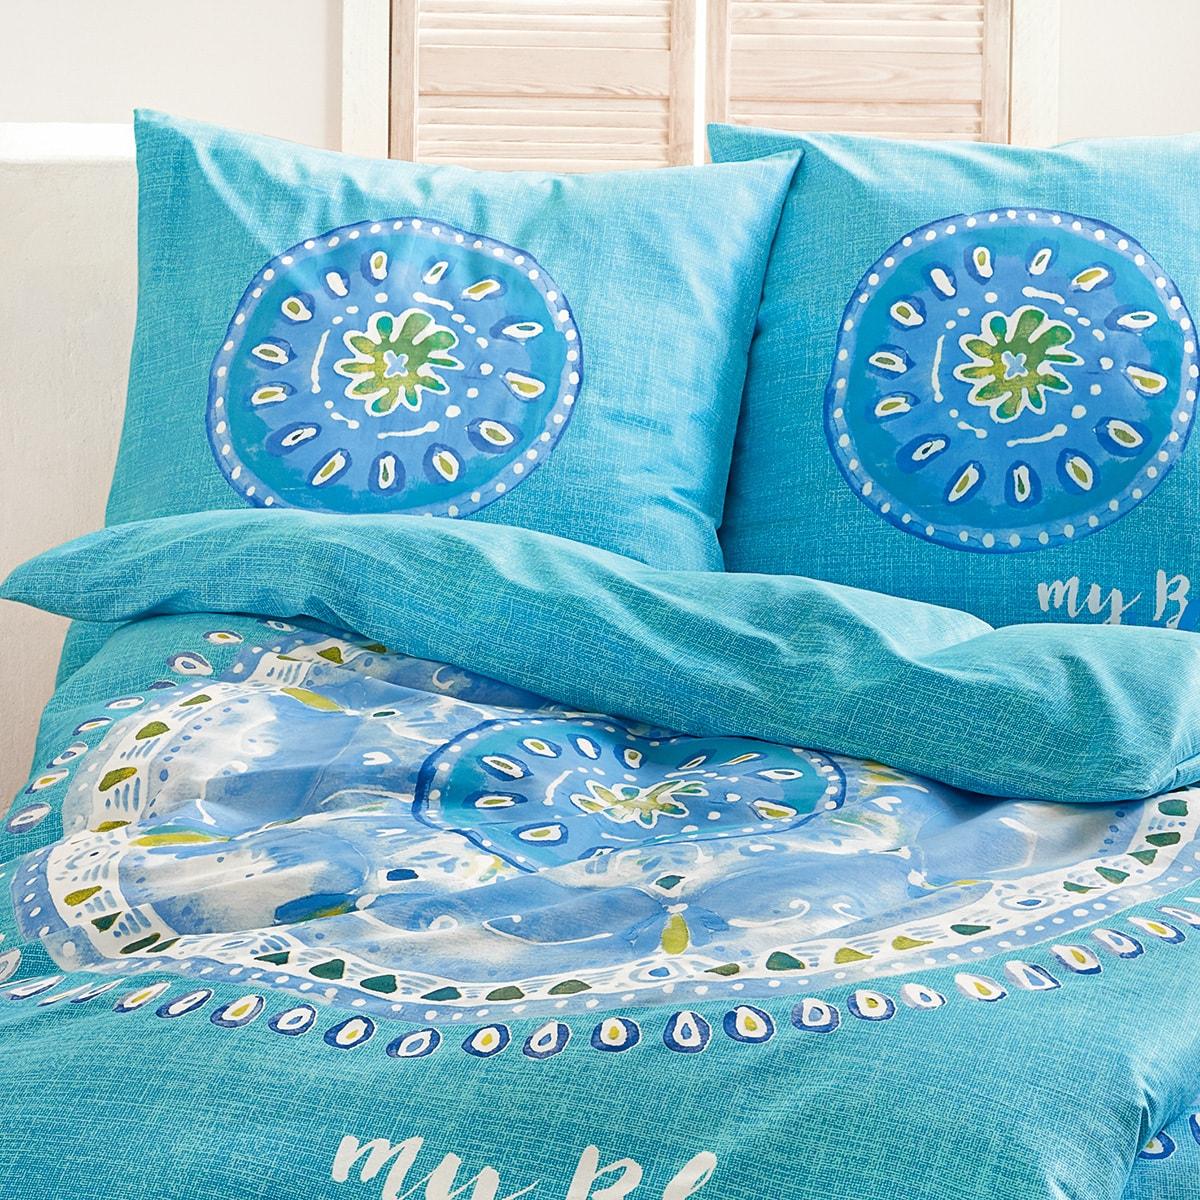 living dreams mako satin bettw sche blue island g nstig online kaufen bei bettwaren shop. Black Bedroom Furniture Sets. Home Design Ideas